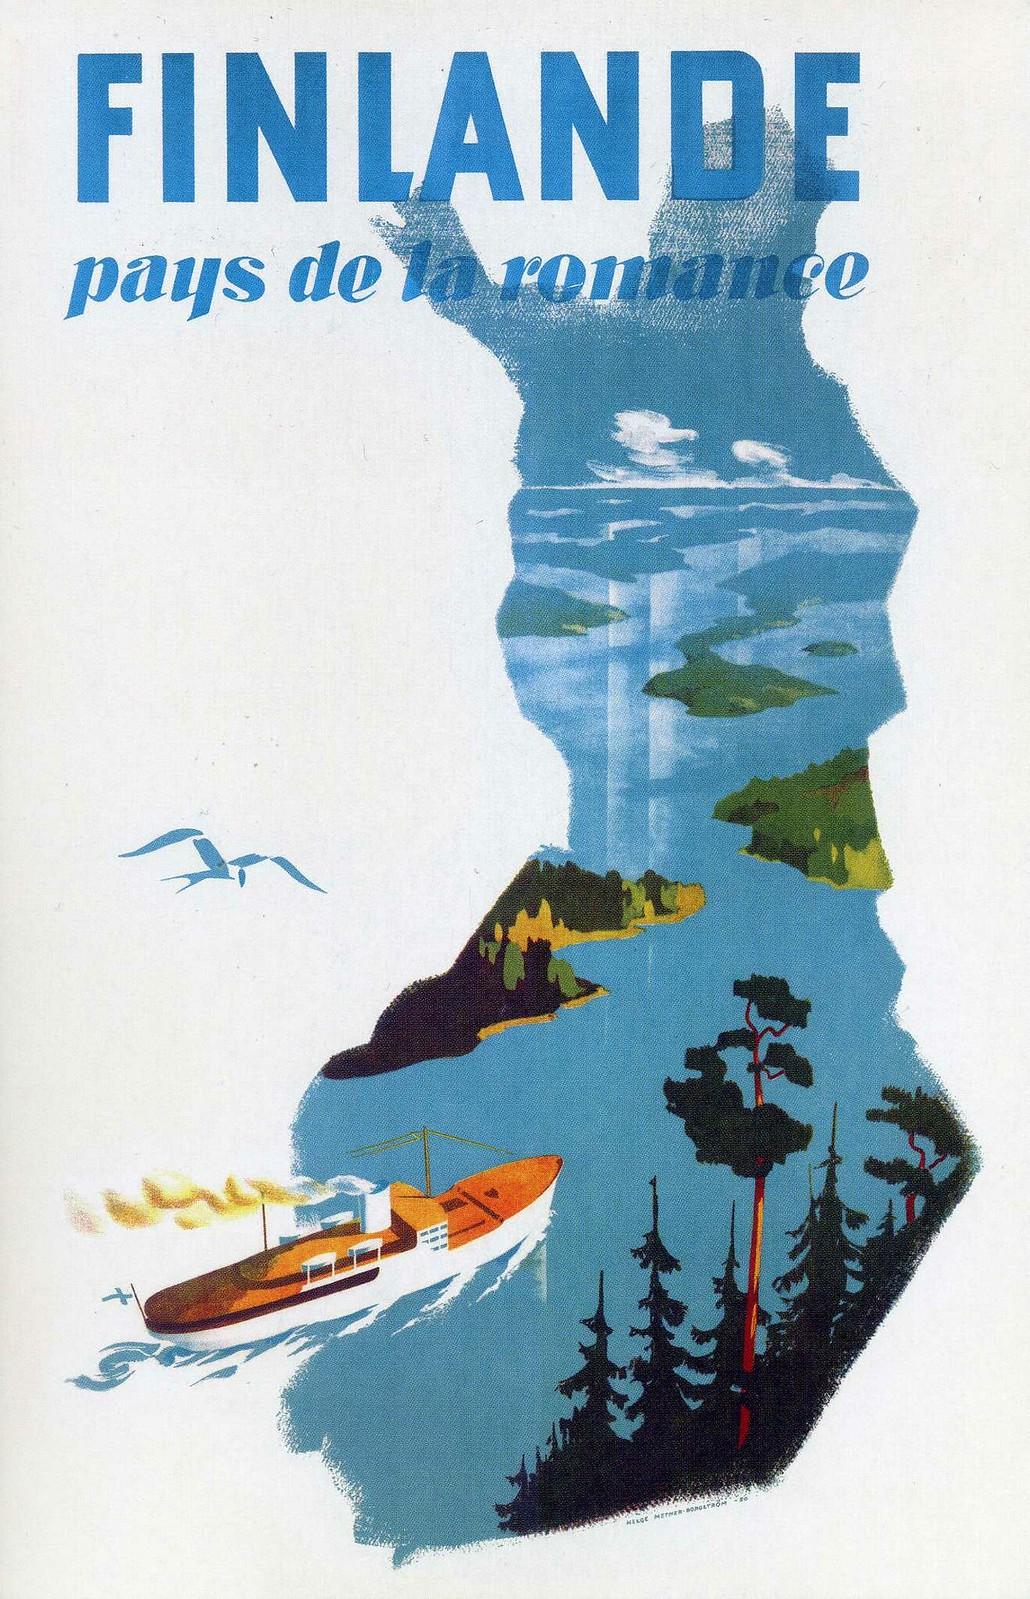 Finlande, french, old travel ad, pays de la romance, ranskankielinen vanha matkamainos